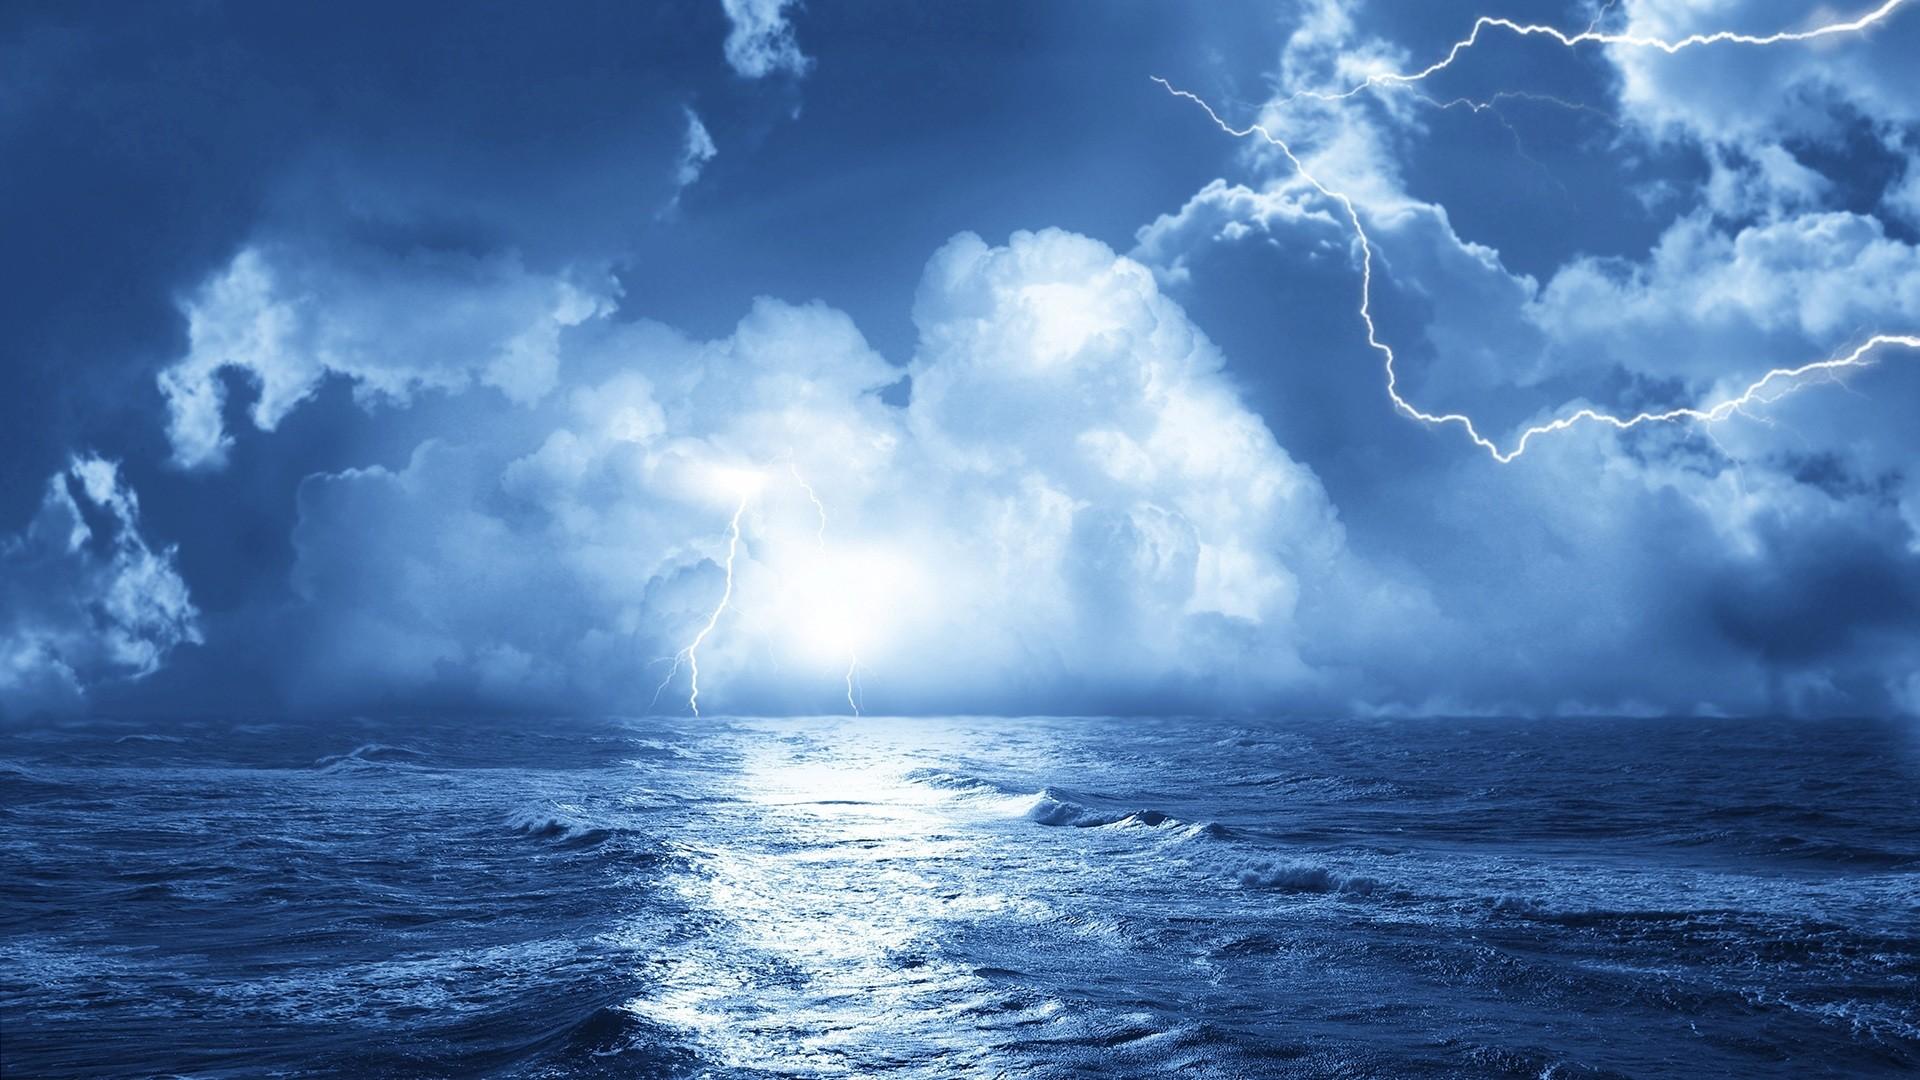 Rain Storm Wallpaper Hd Thunderstorm wallpaper hd